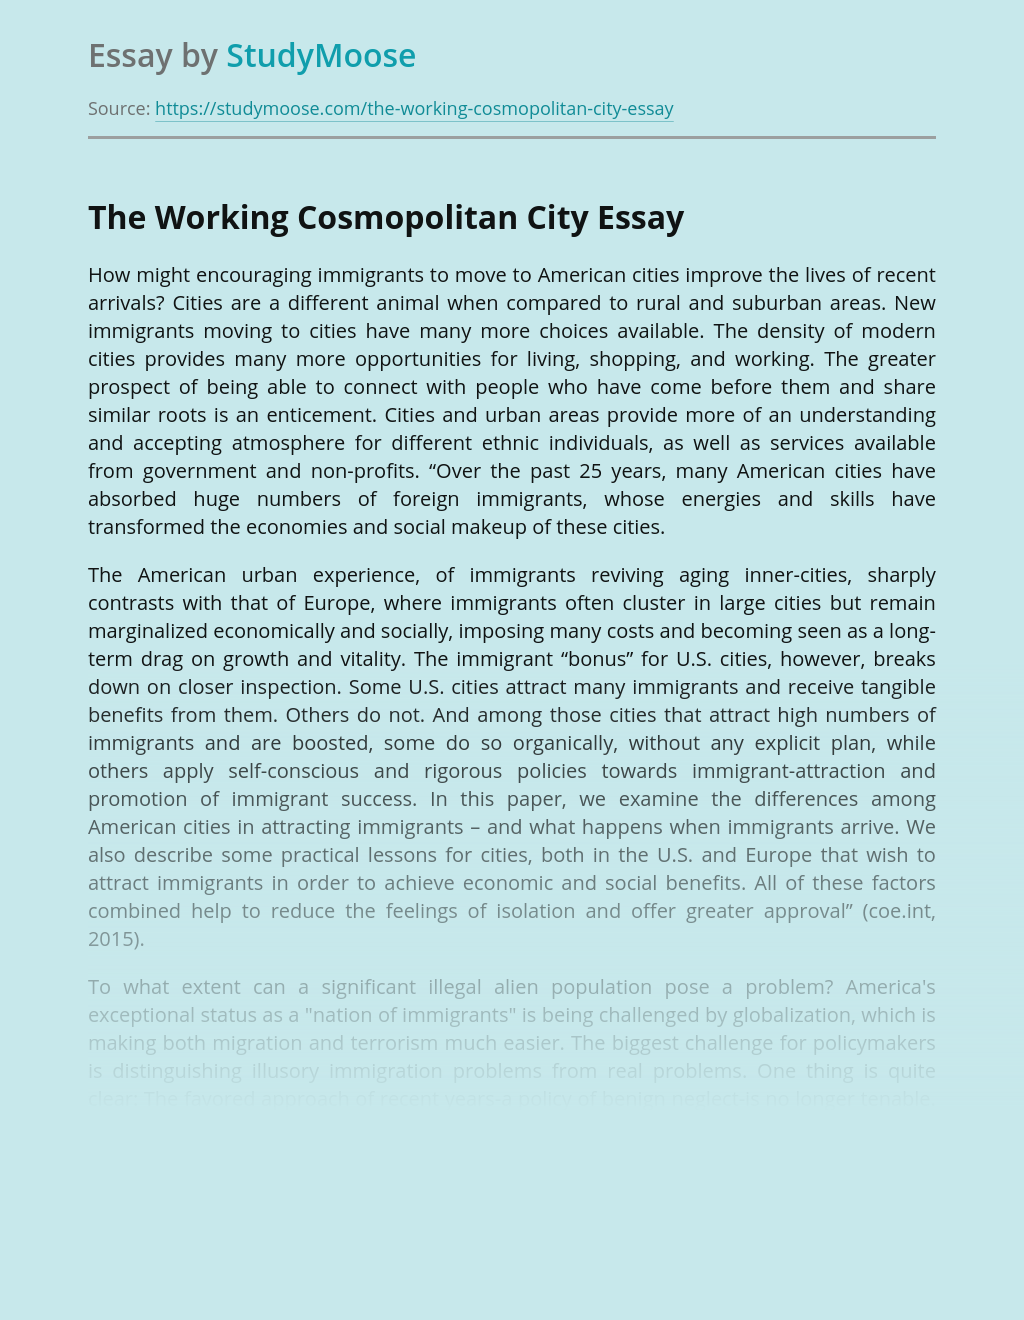 The Working Cosmopolitan City